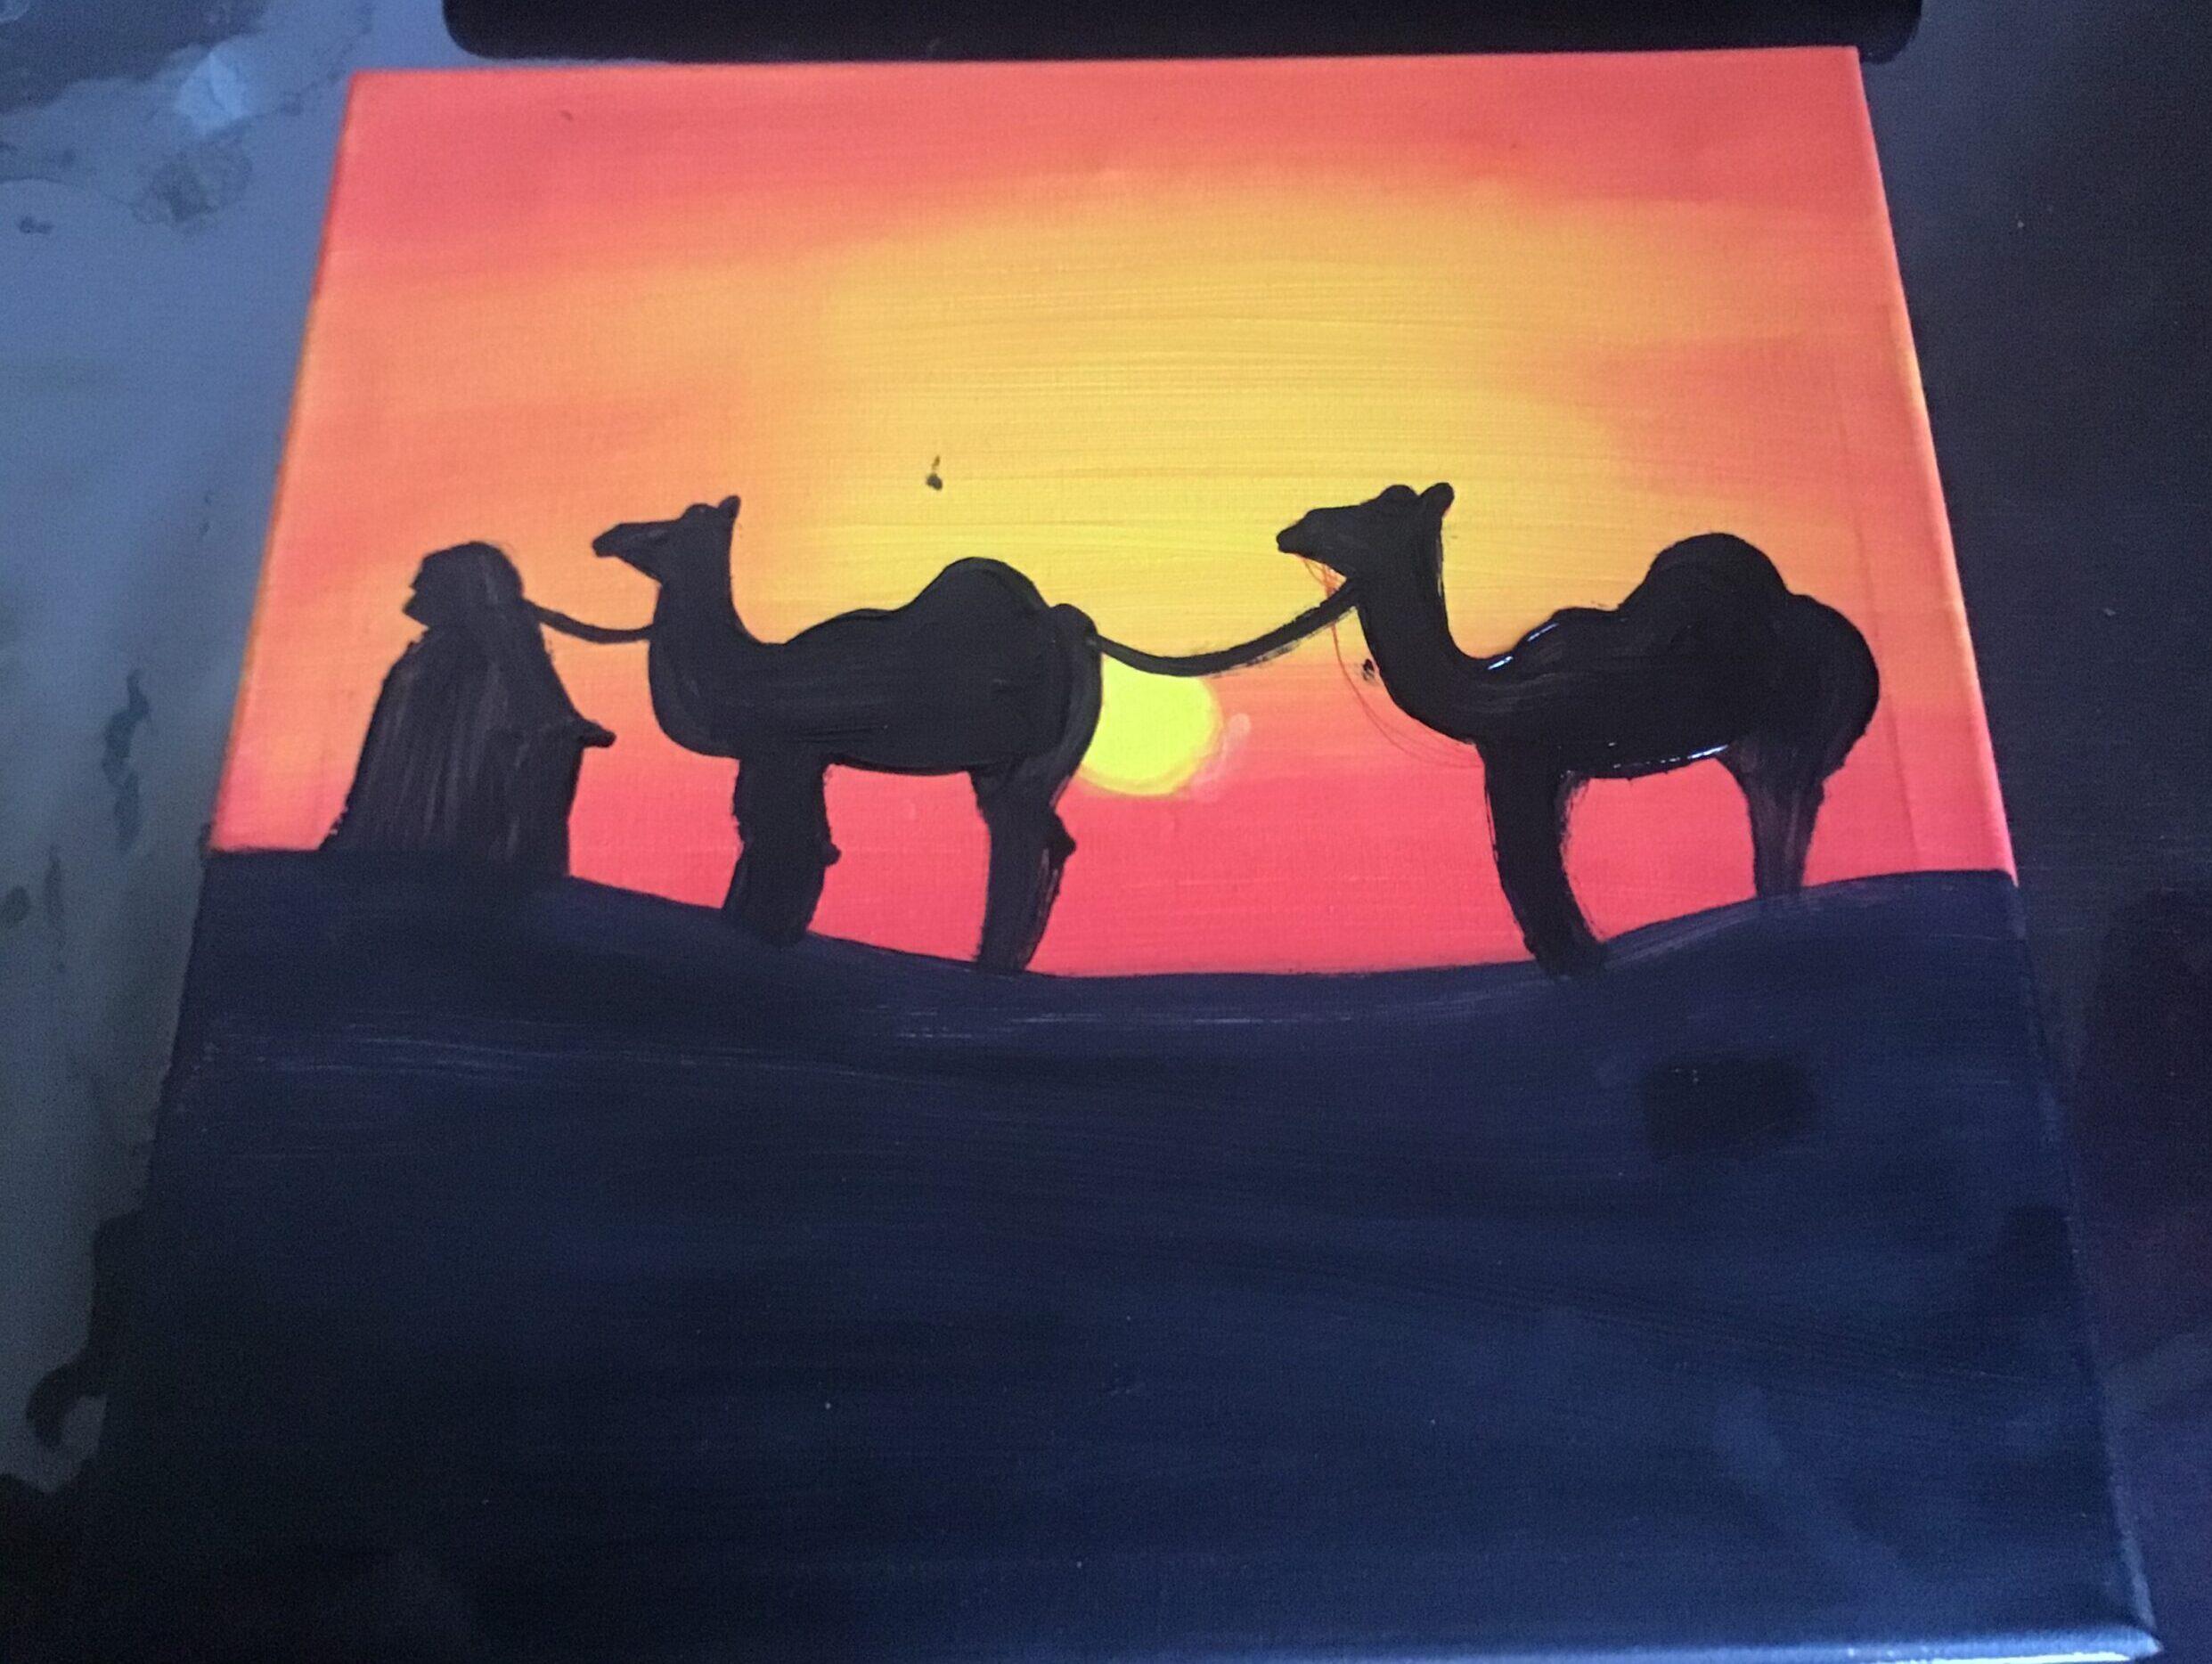 Artwork by Sahla Shemil